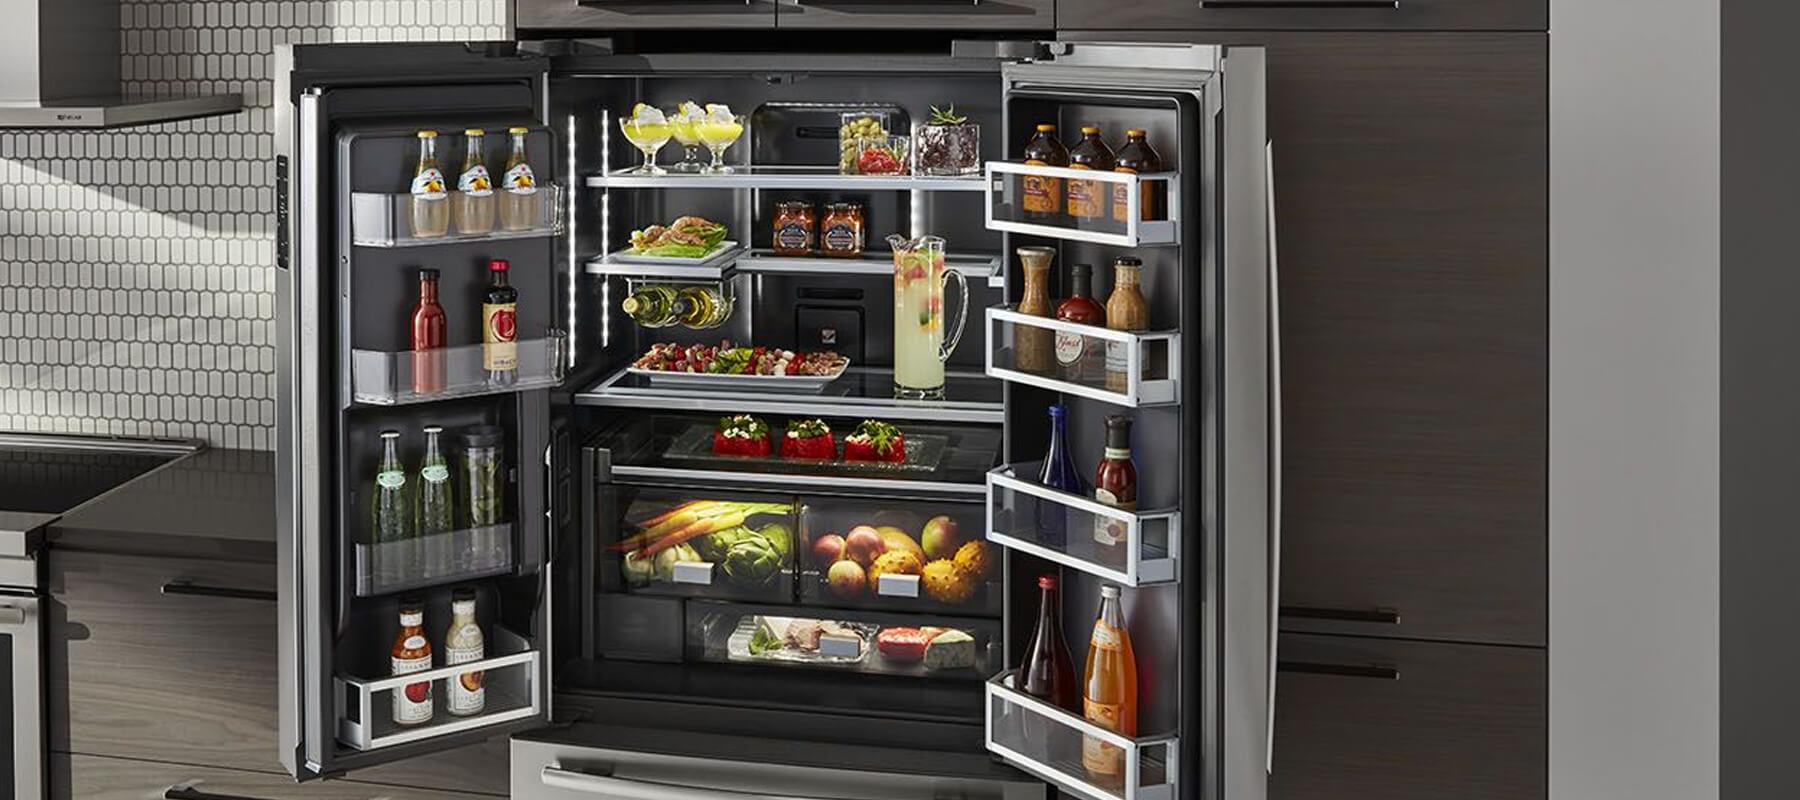 Jenn Air Built in Refrigerator Repair Near Me | Built-in Refrigerator Repair